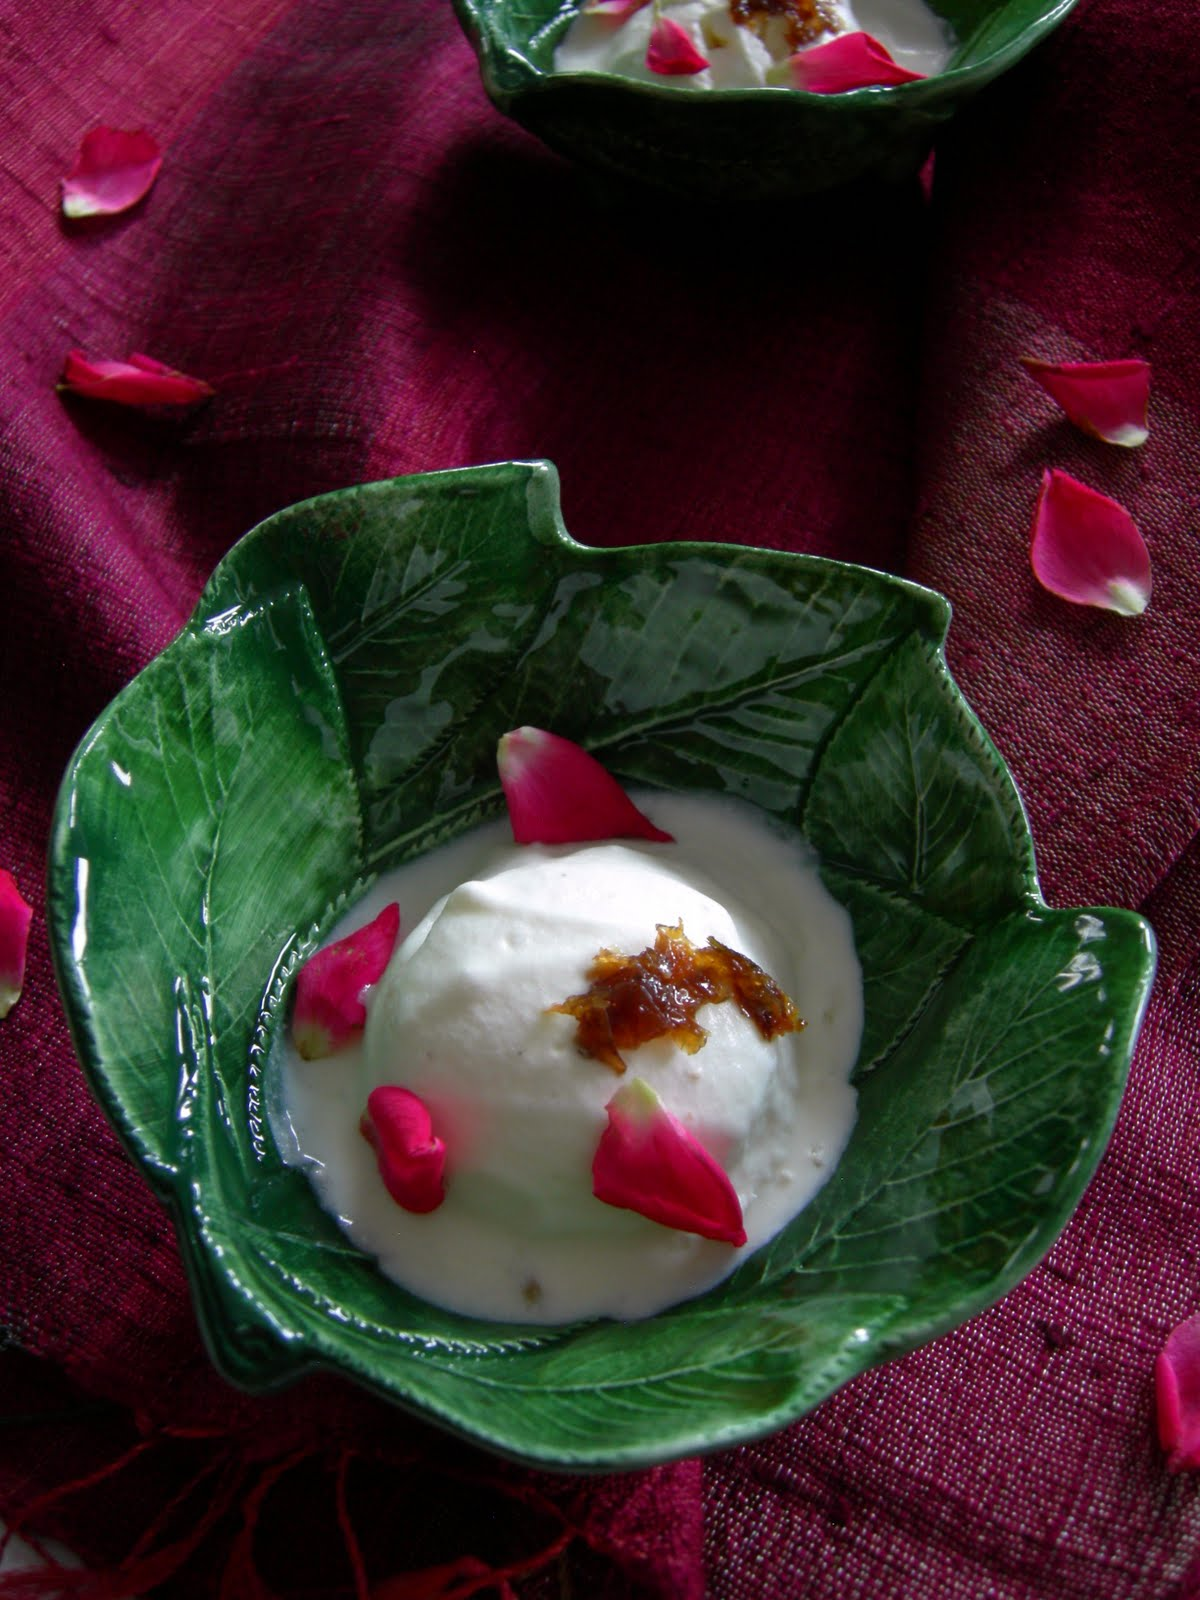 ... Gulkand Elaichi Ice Cream / Rose-Petal preserve and Cardamom Ice Cream